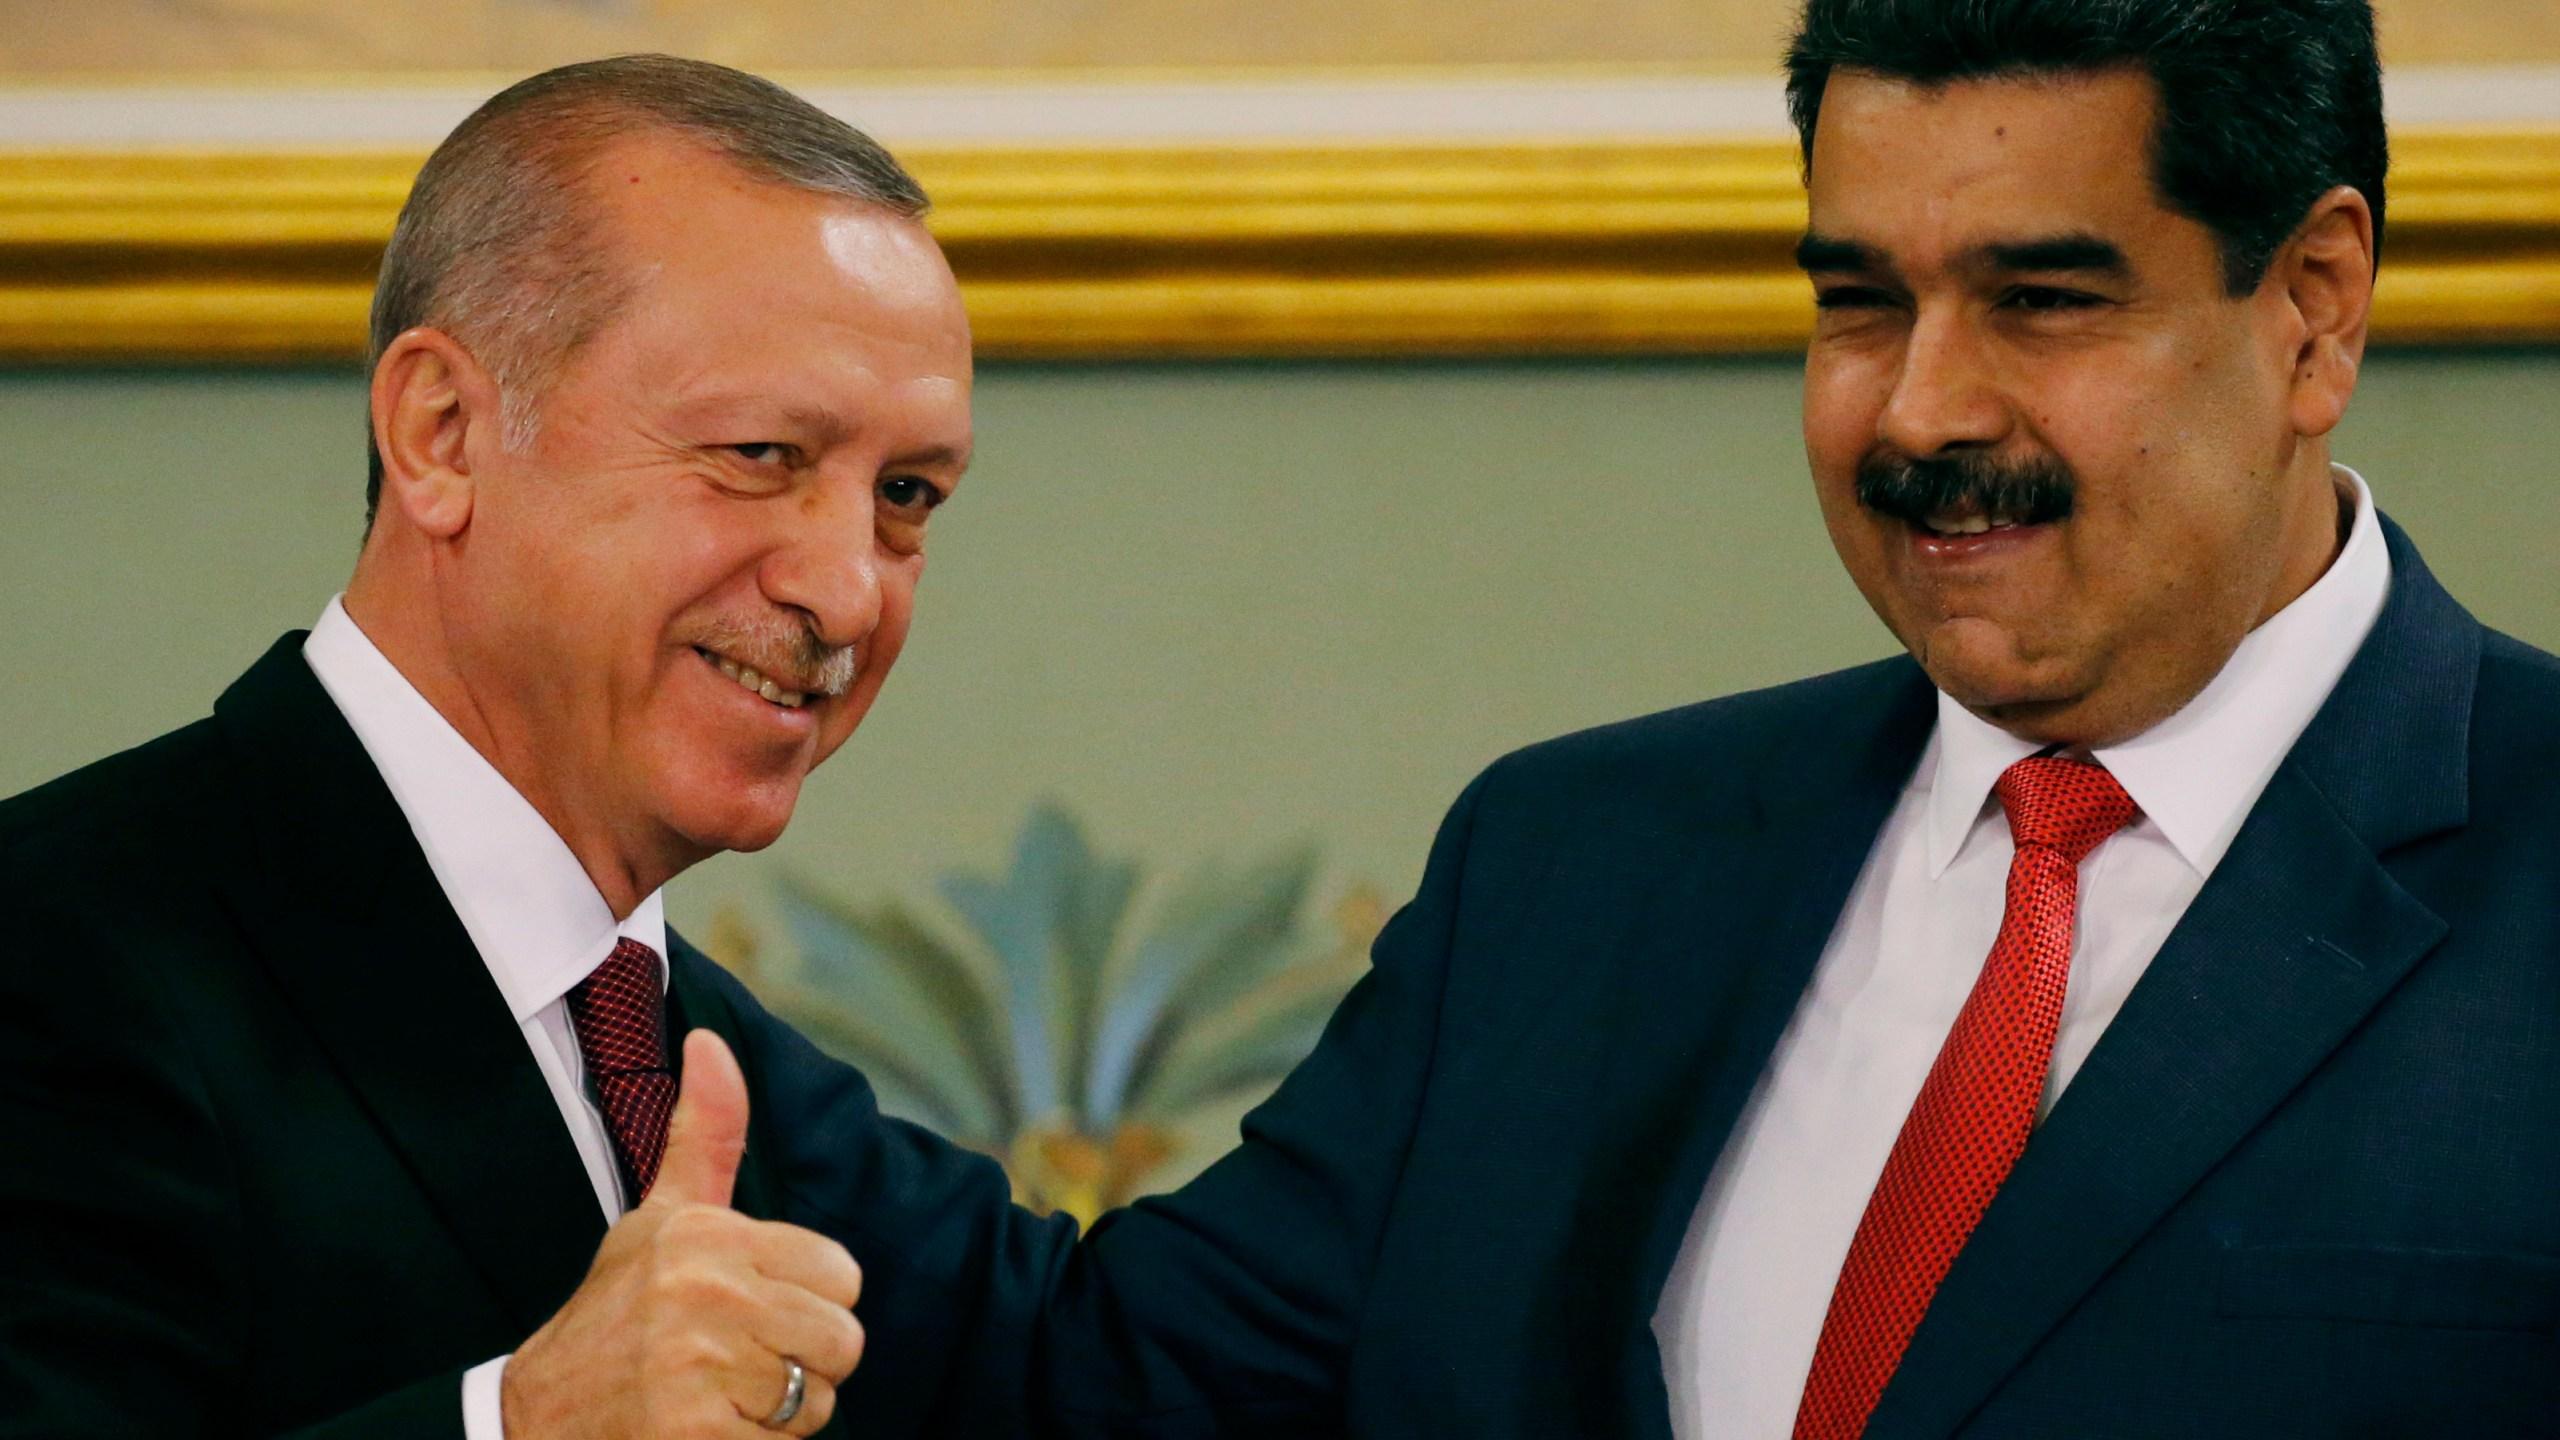 Nicolas Maduro, Recep Tayyip Erdogan, Ermine Erdogan, Cilia Flores